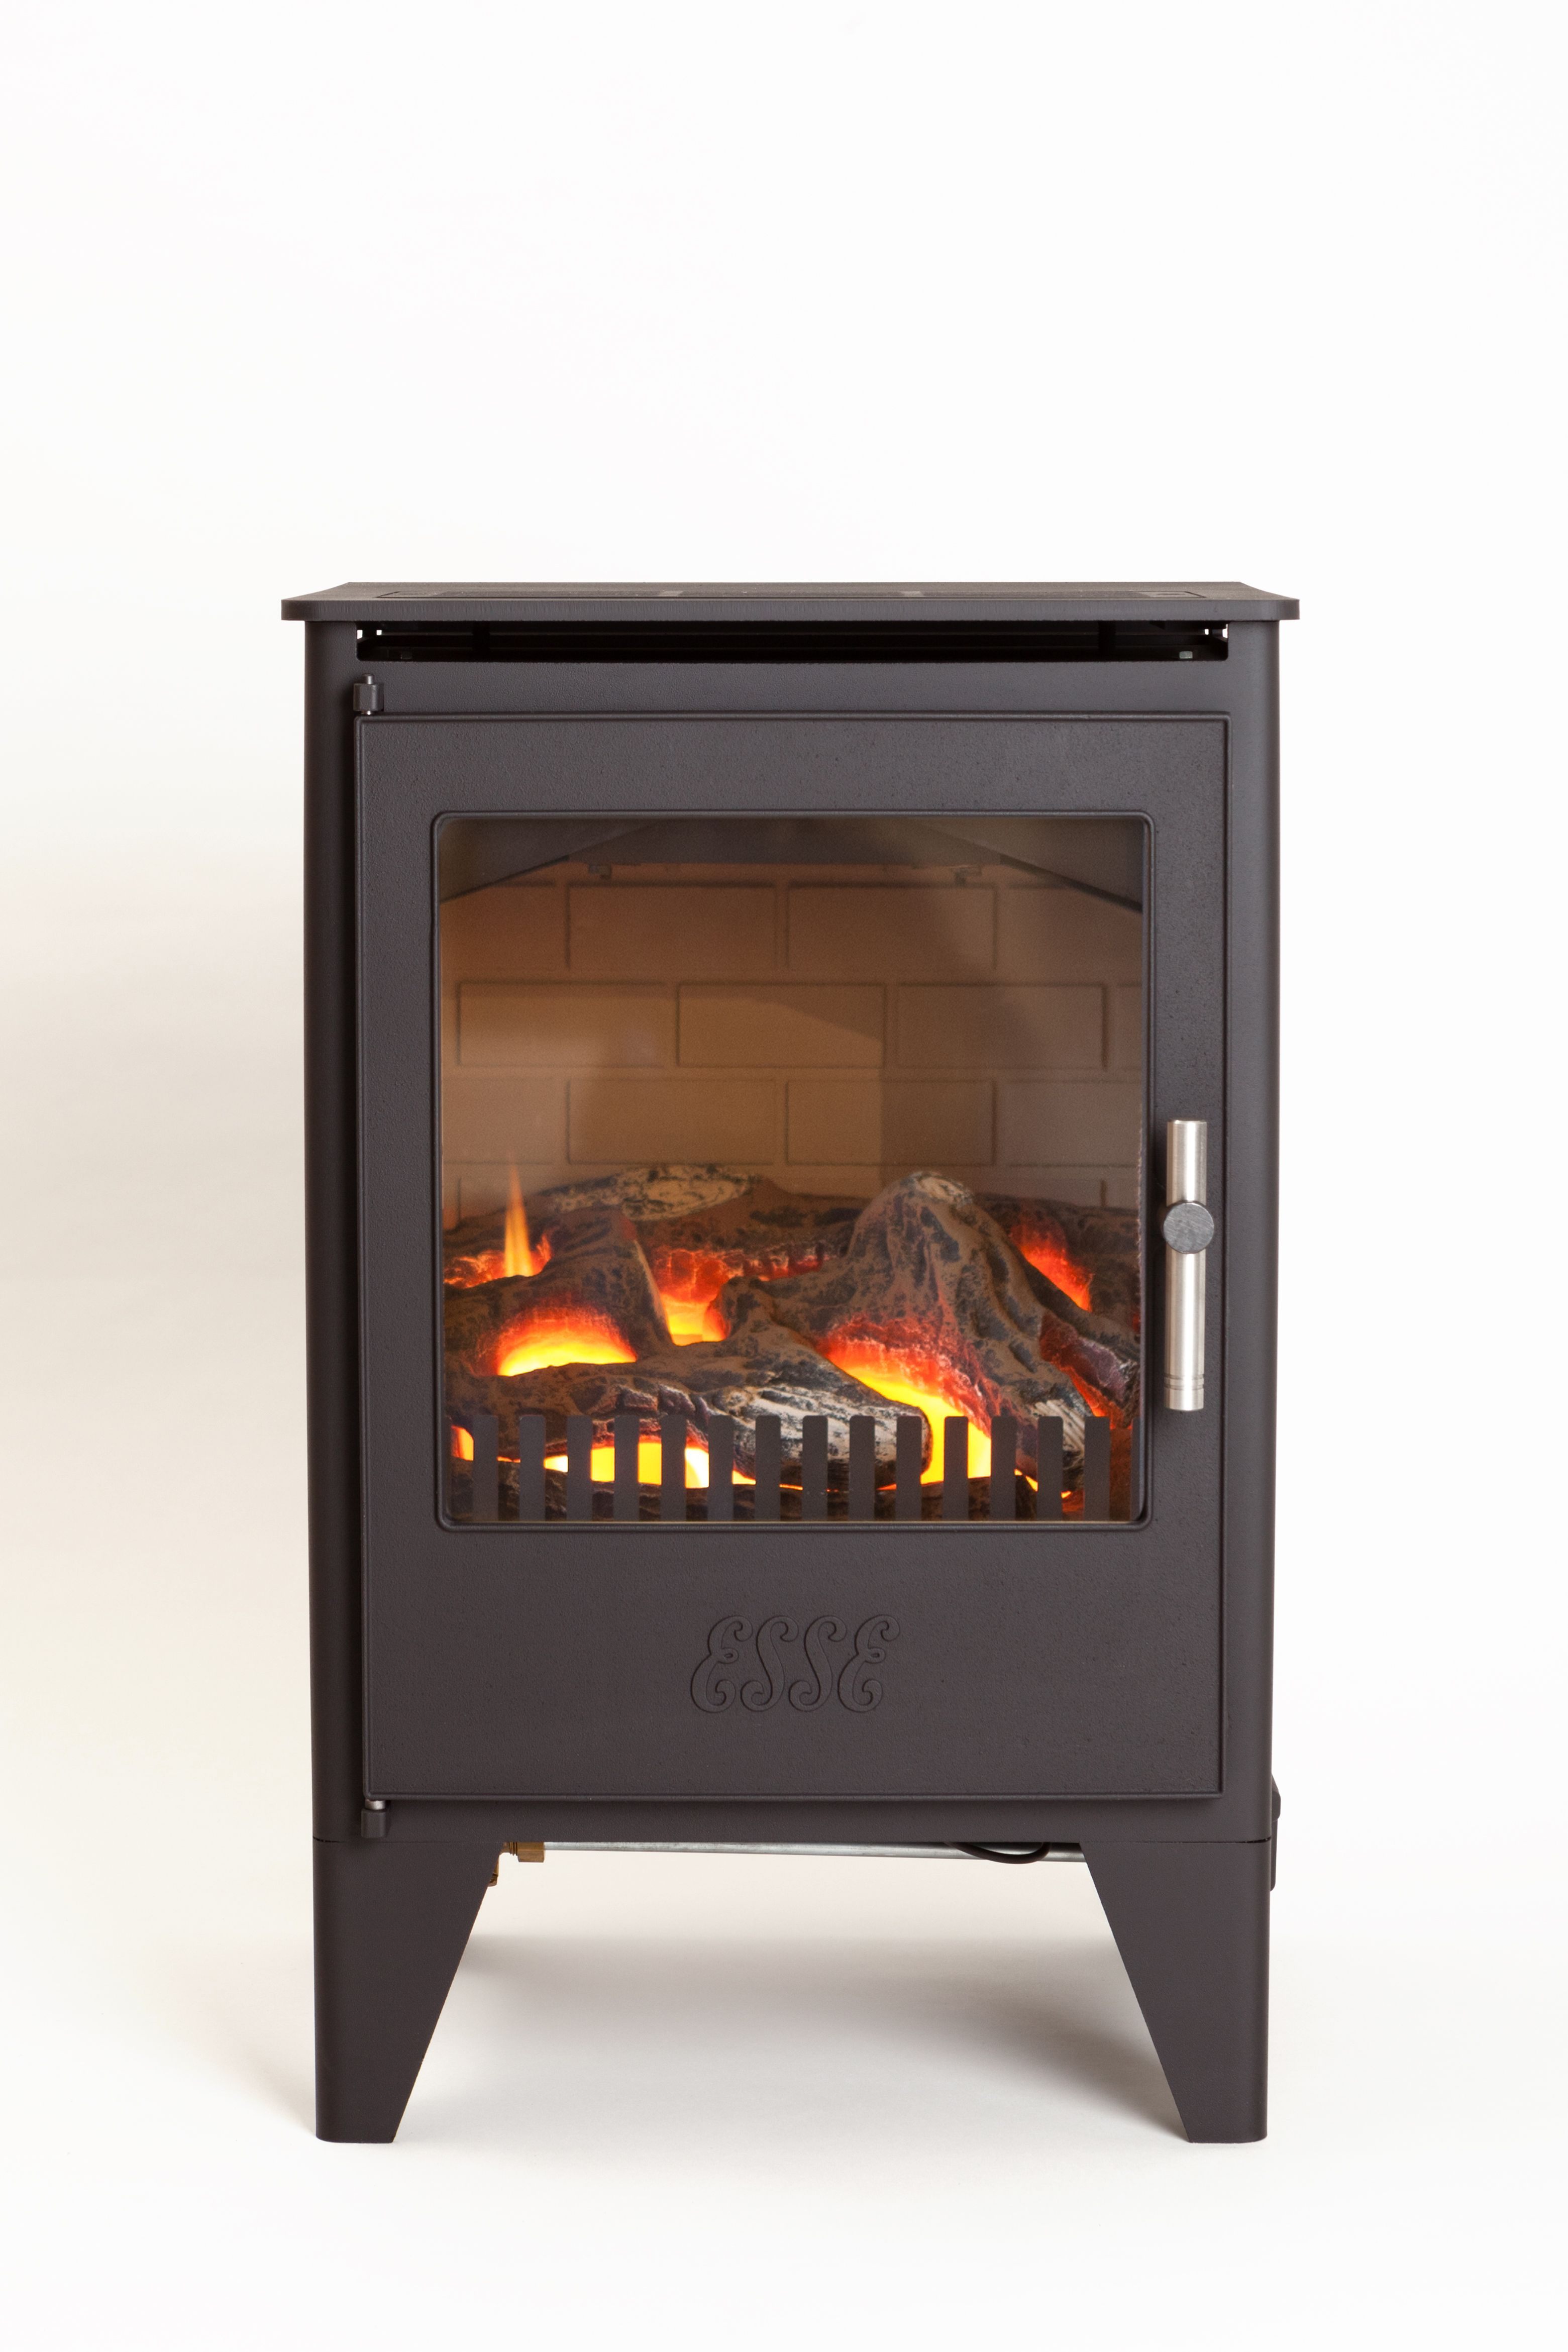 esse 550 flueless gas fire heat output 3 3kw remote control model